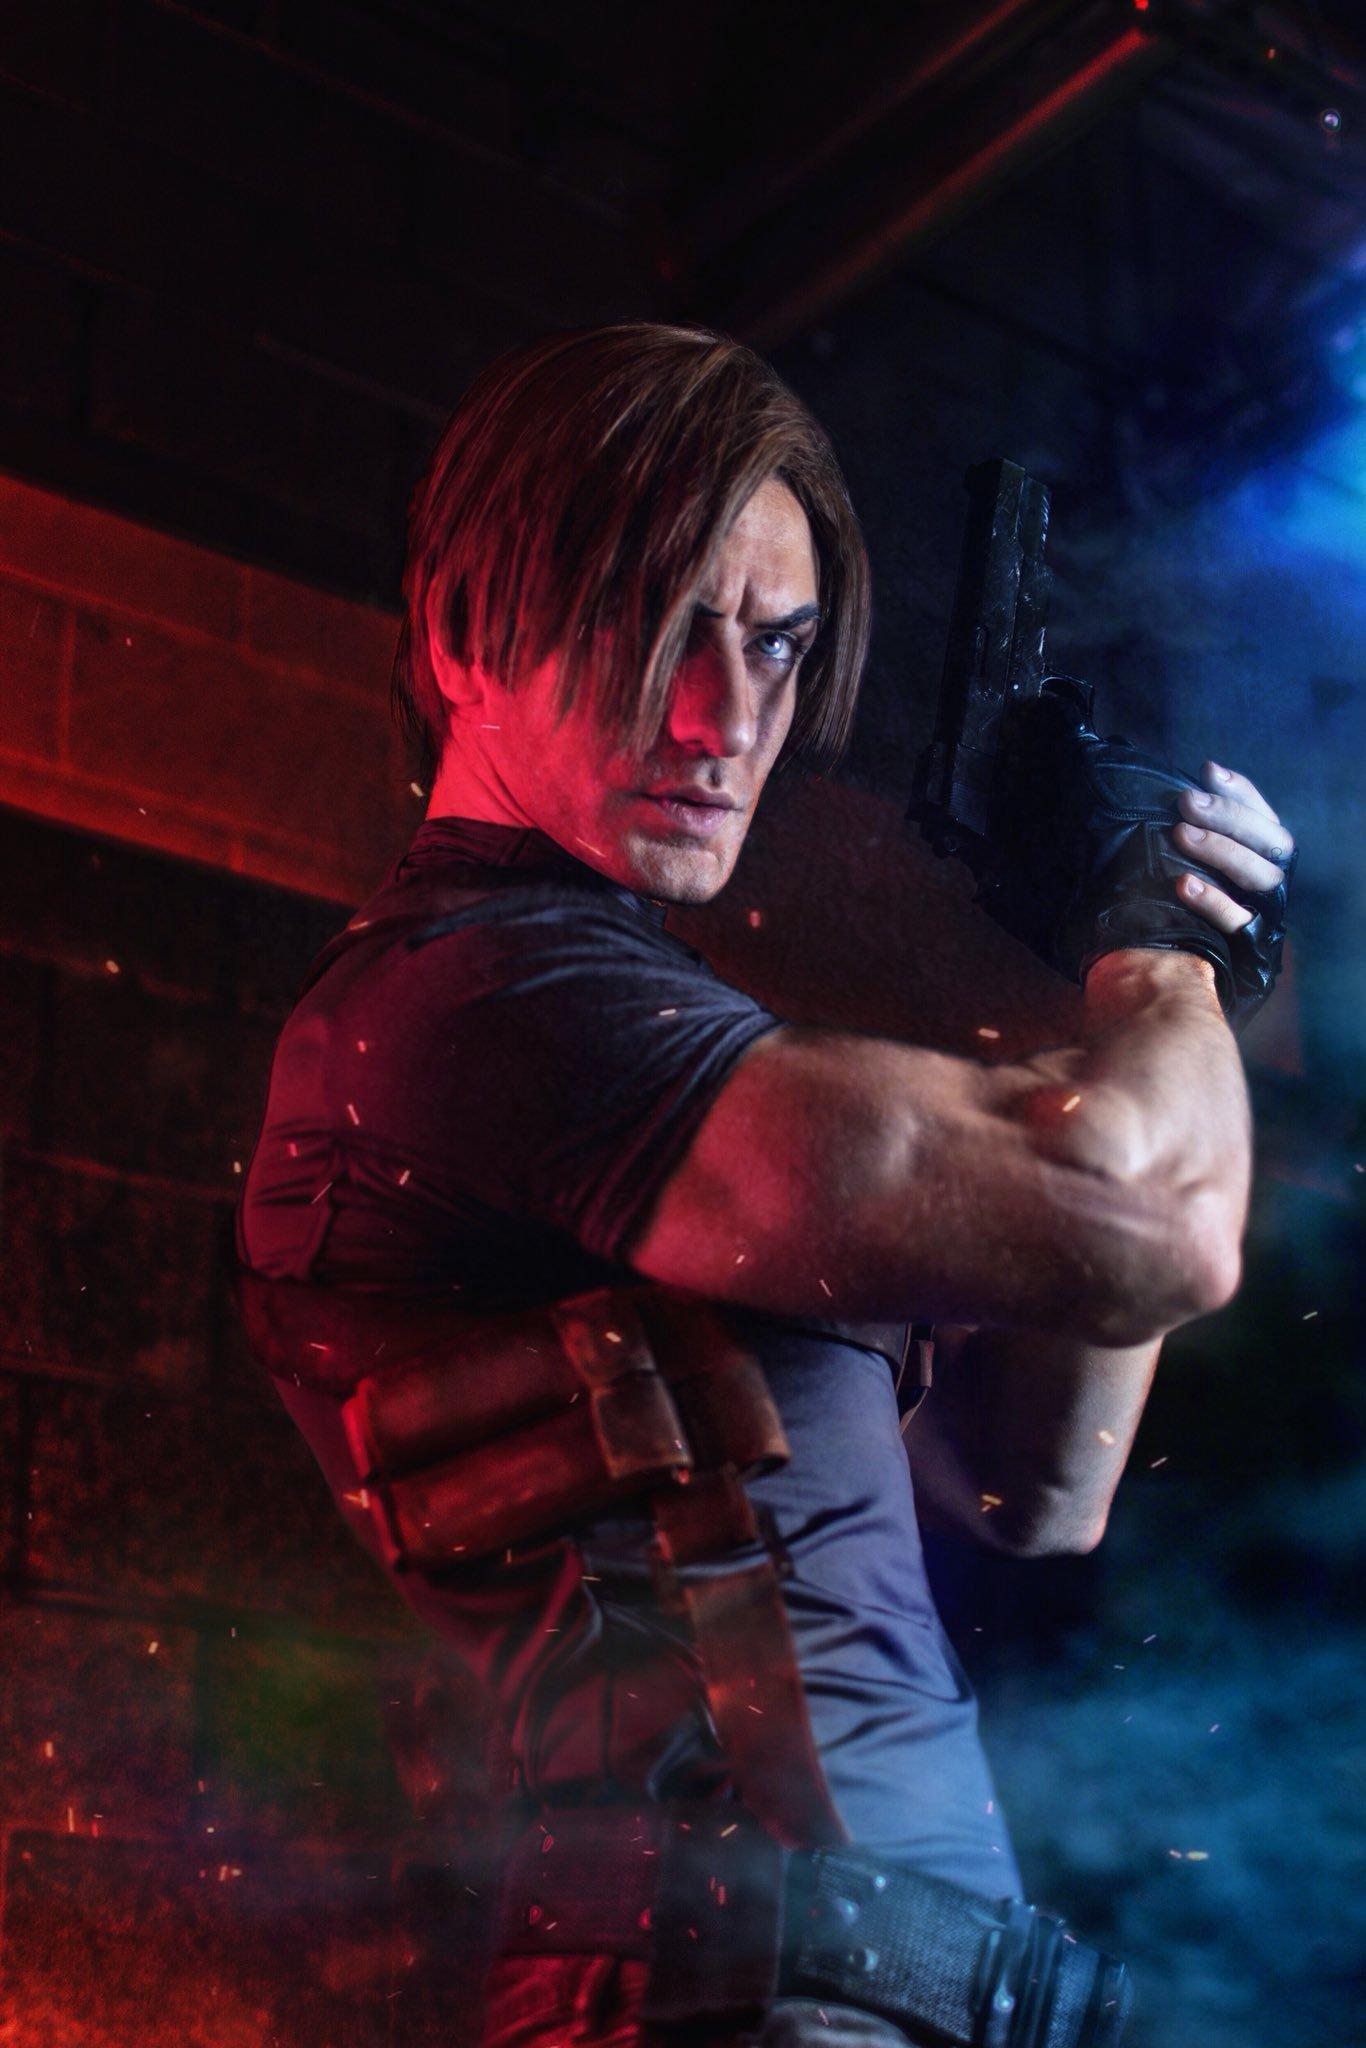 Leon Kennedy Resident Evil 4 Leon Chiro Cosplay Art Online